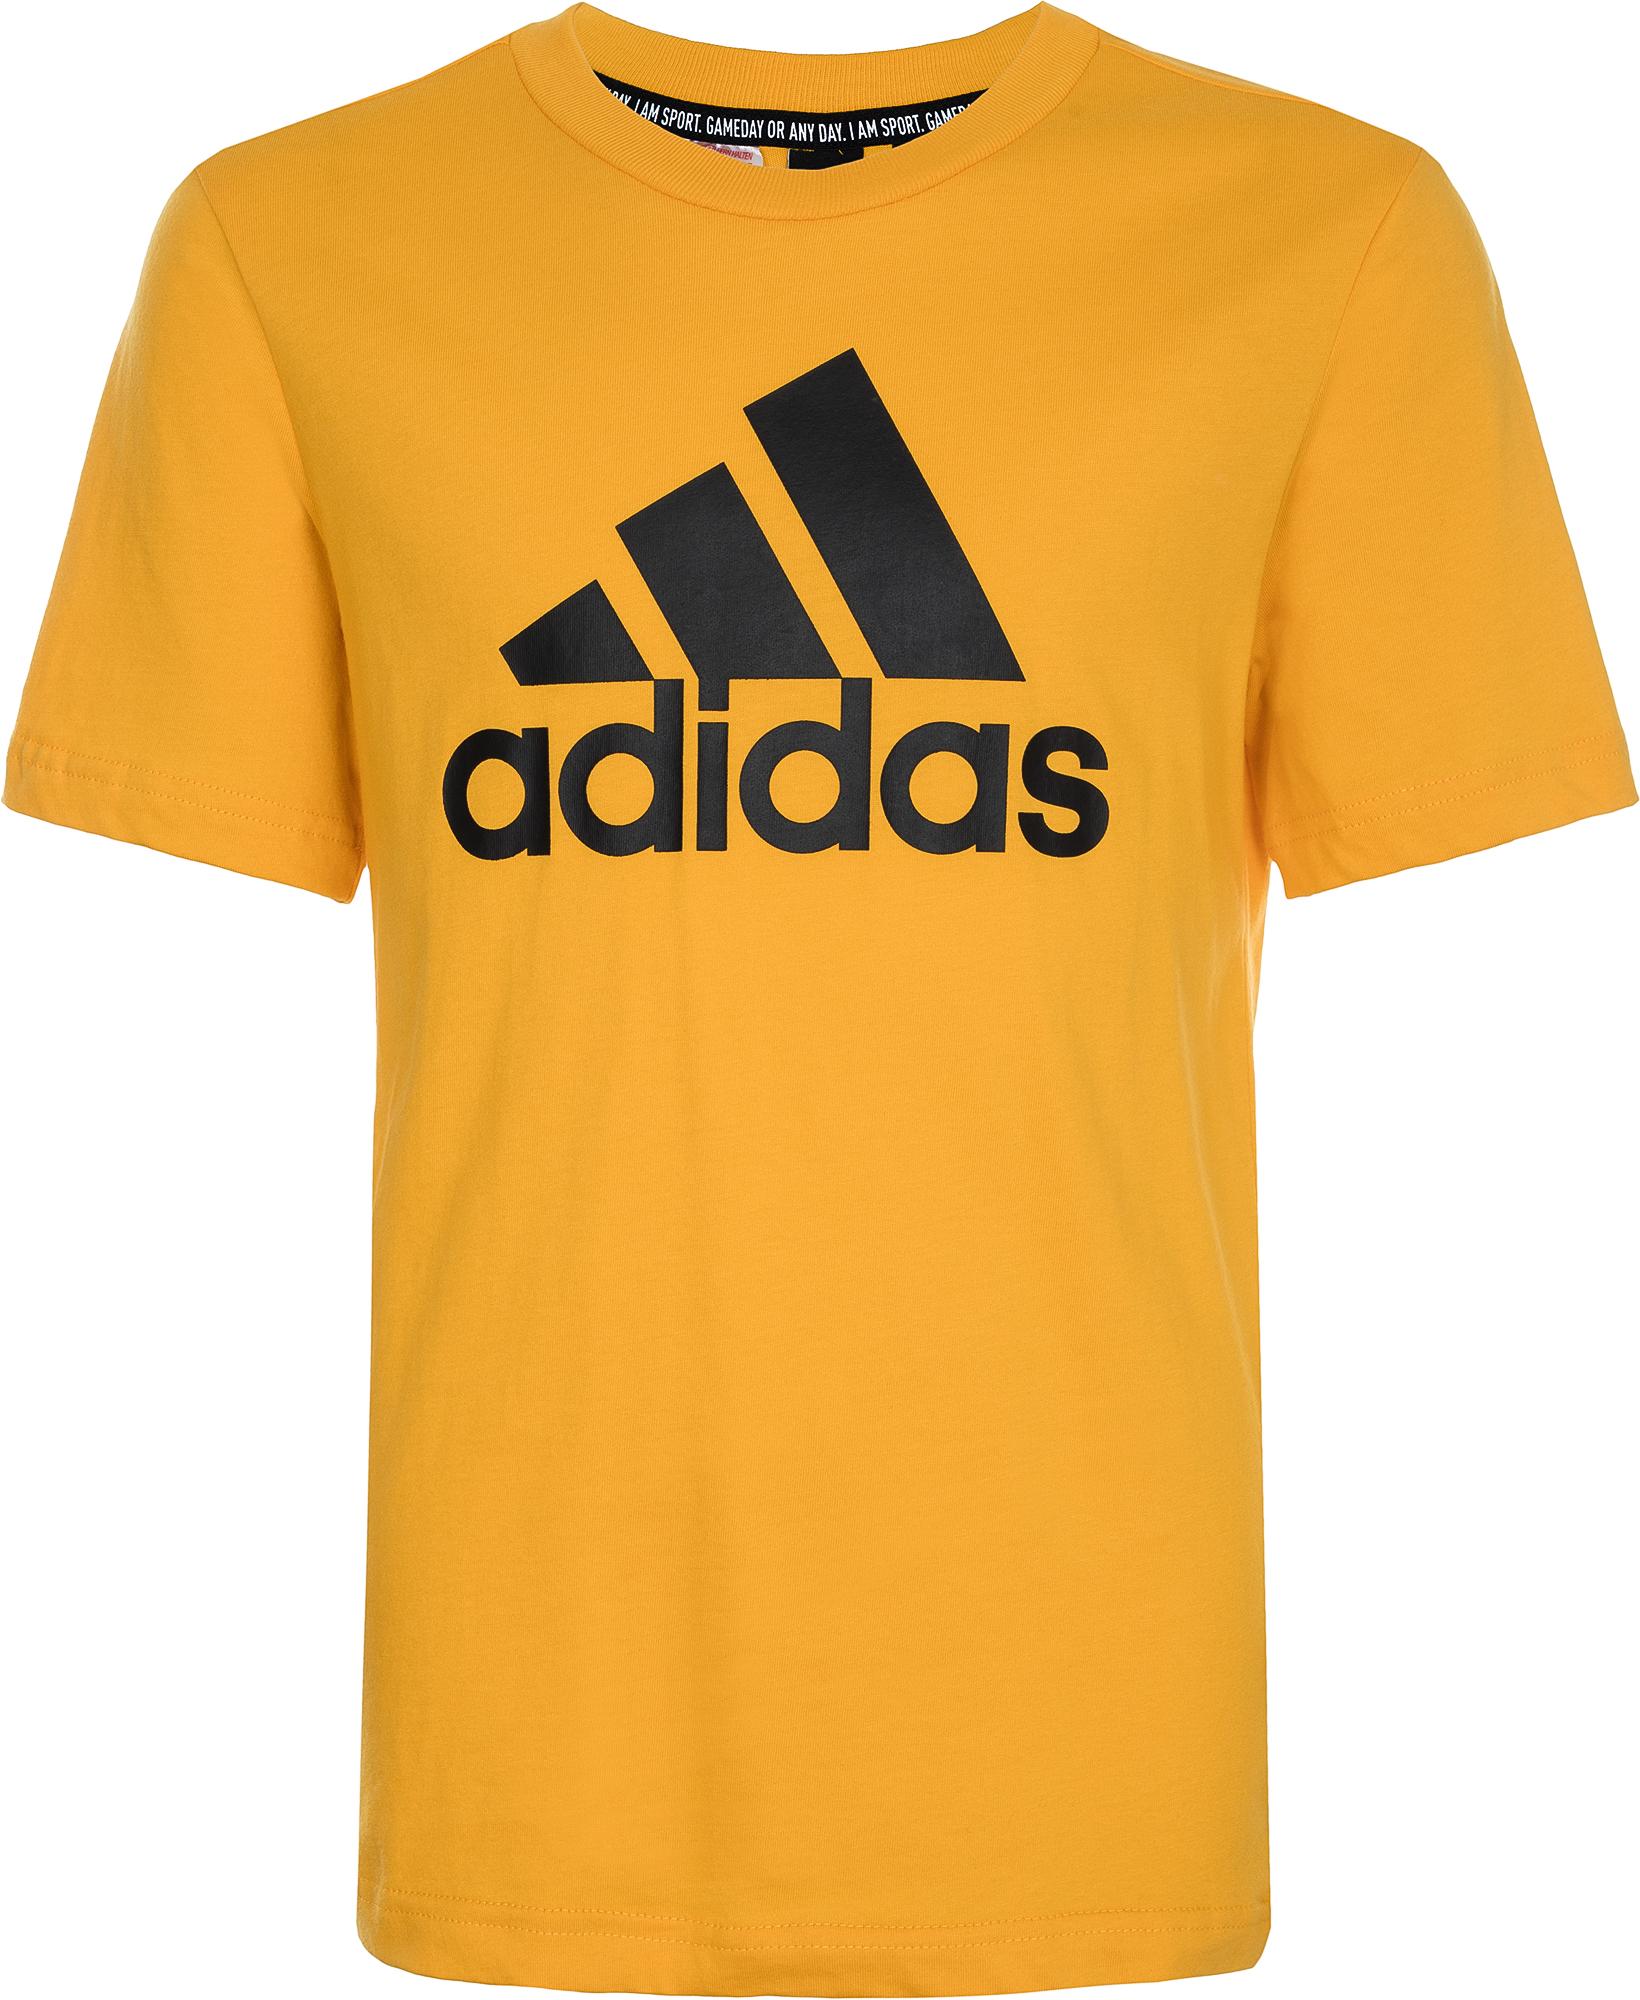 Adidas Футболка для мальчиков Adidas, размер 164